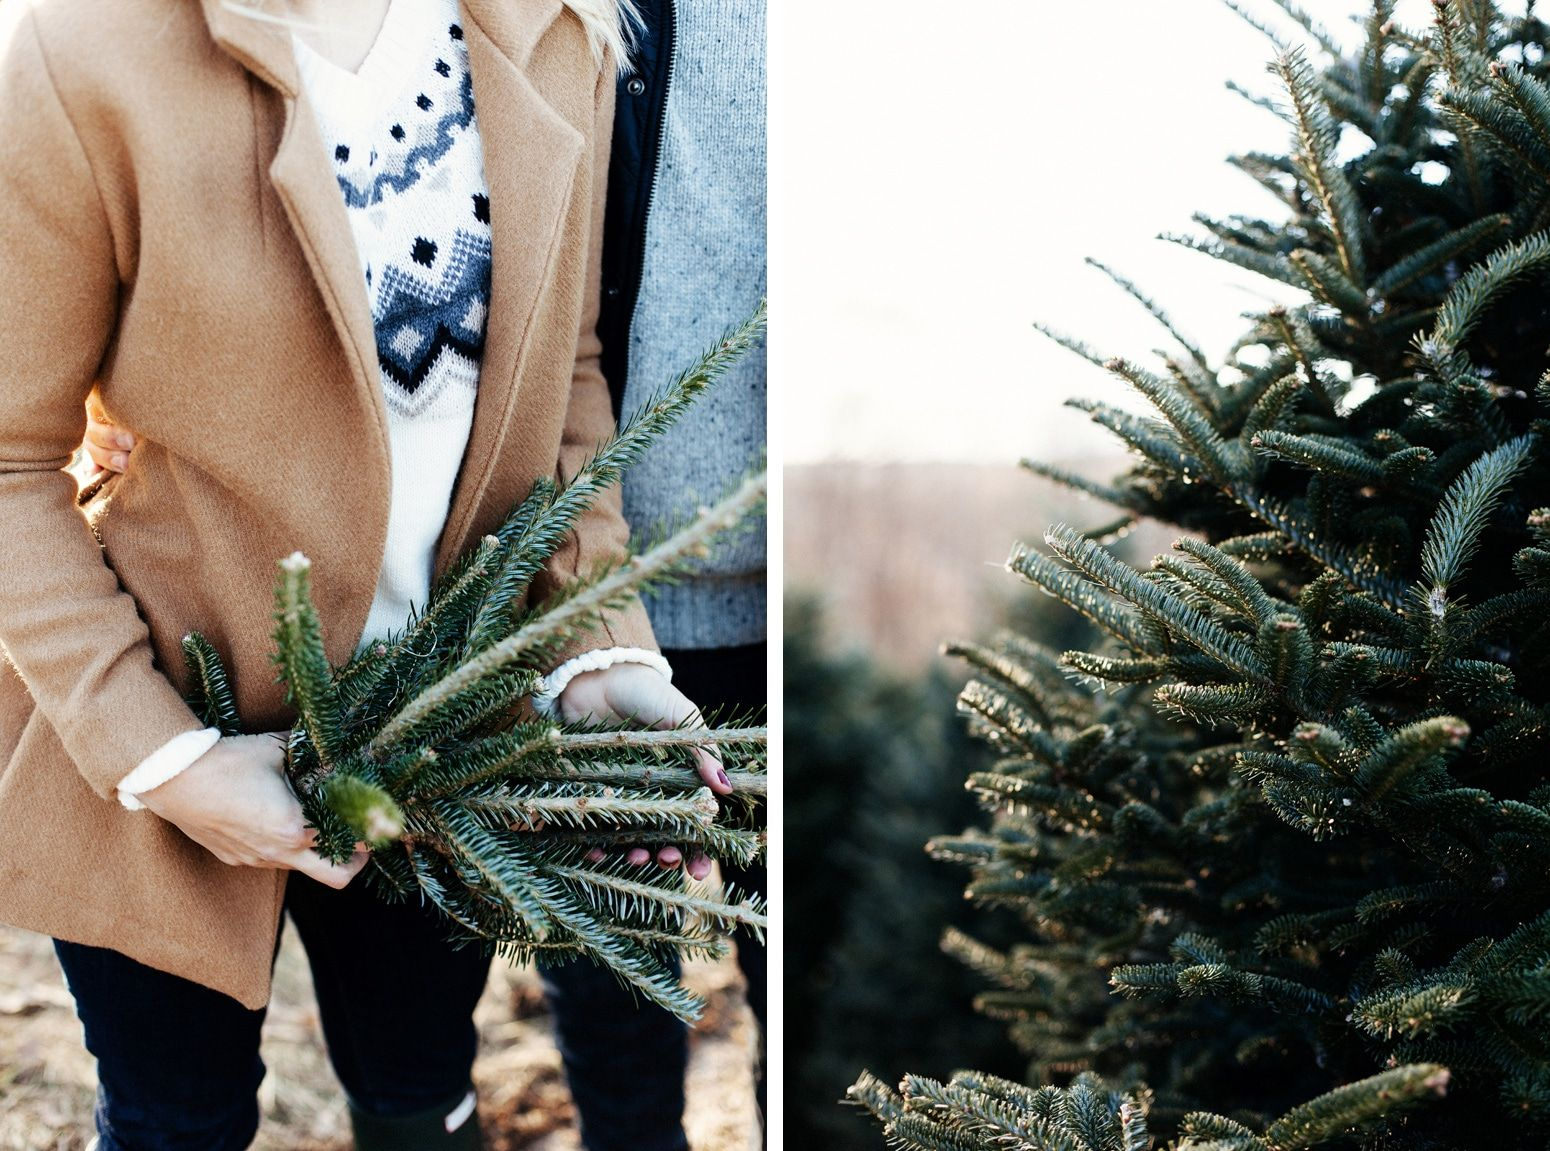 Boone Christmas Tree Hunt Lifestyle Shoot Christmas tree